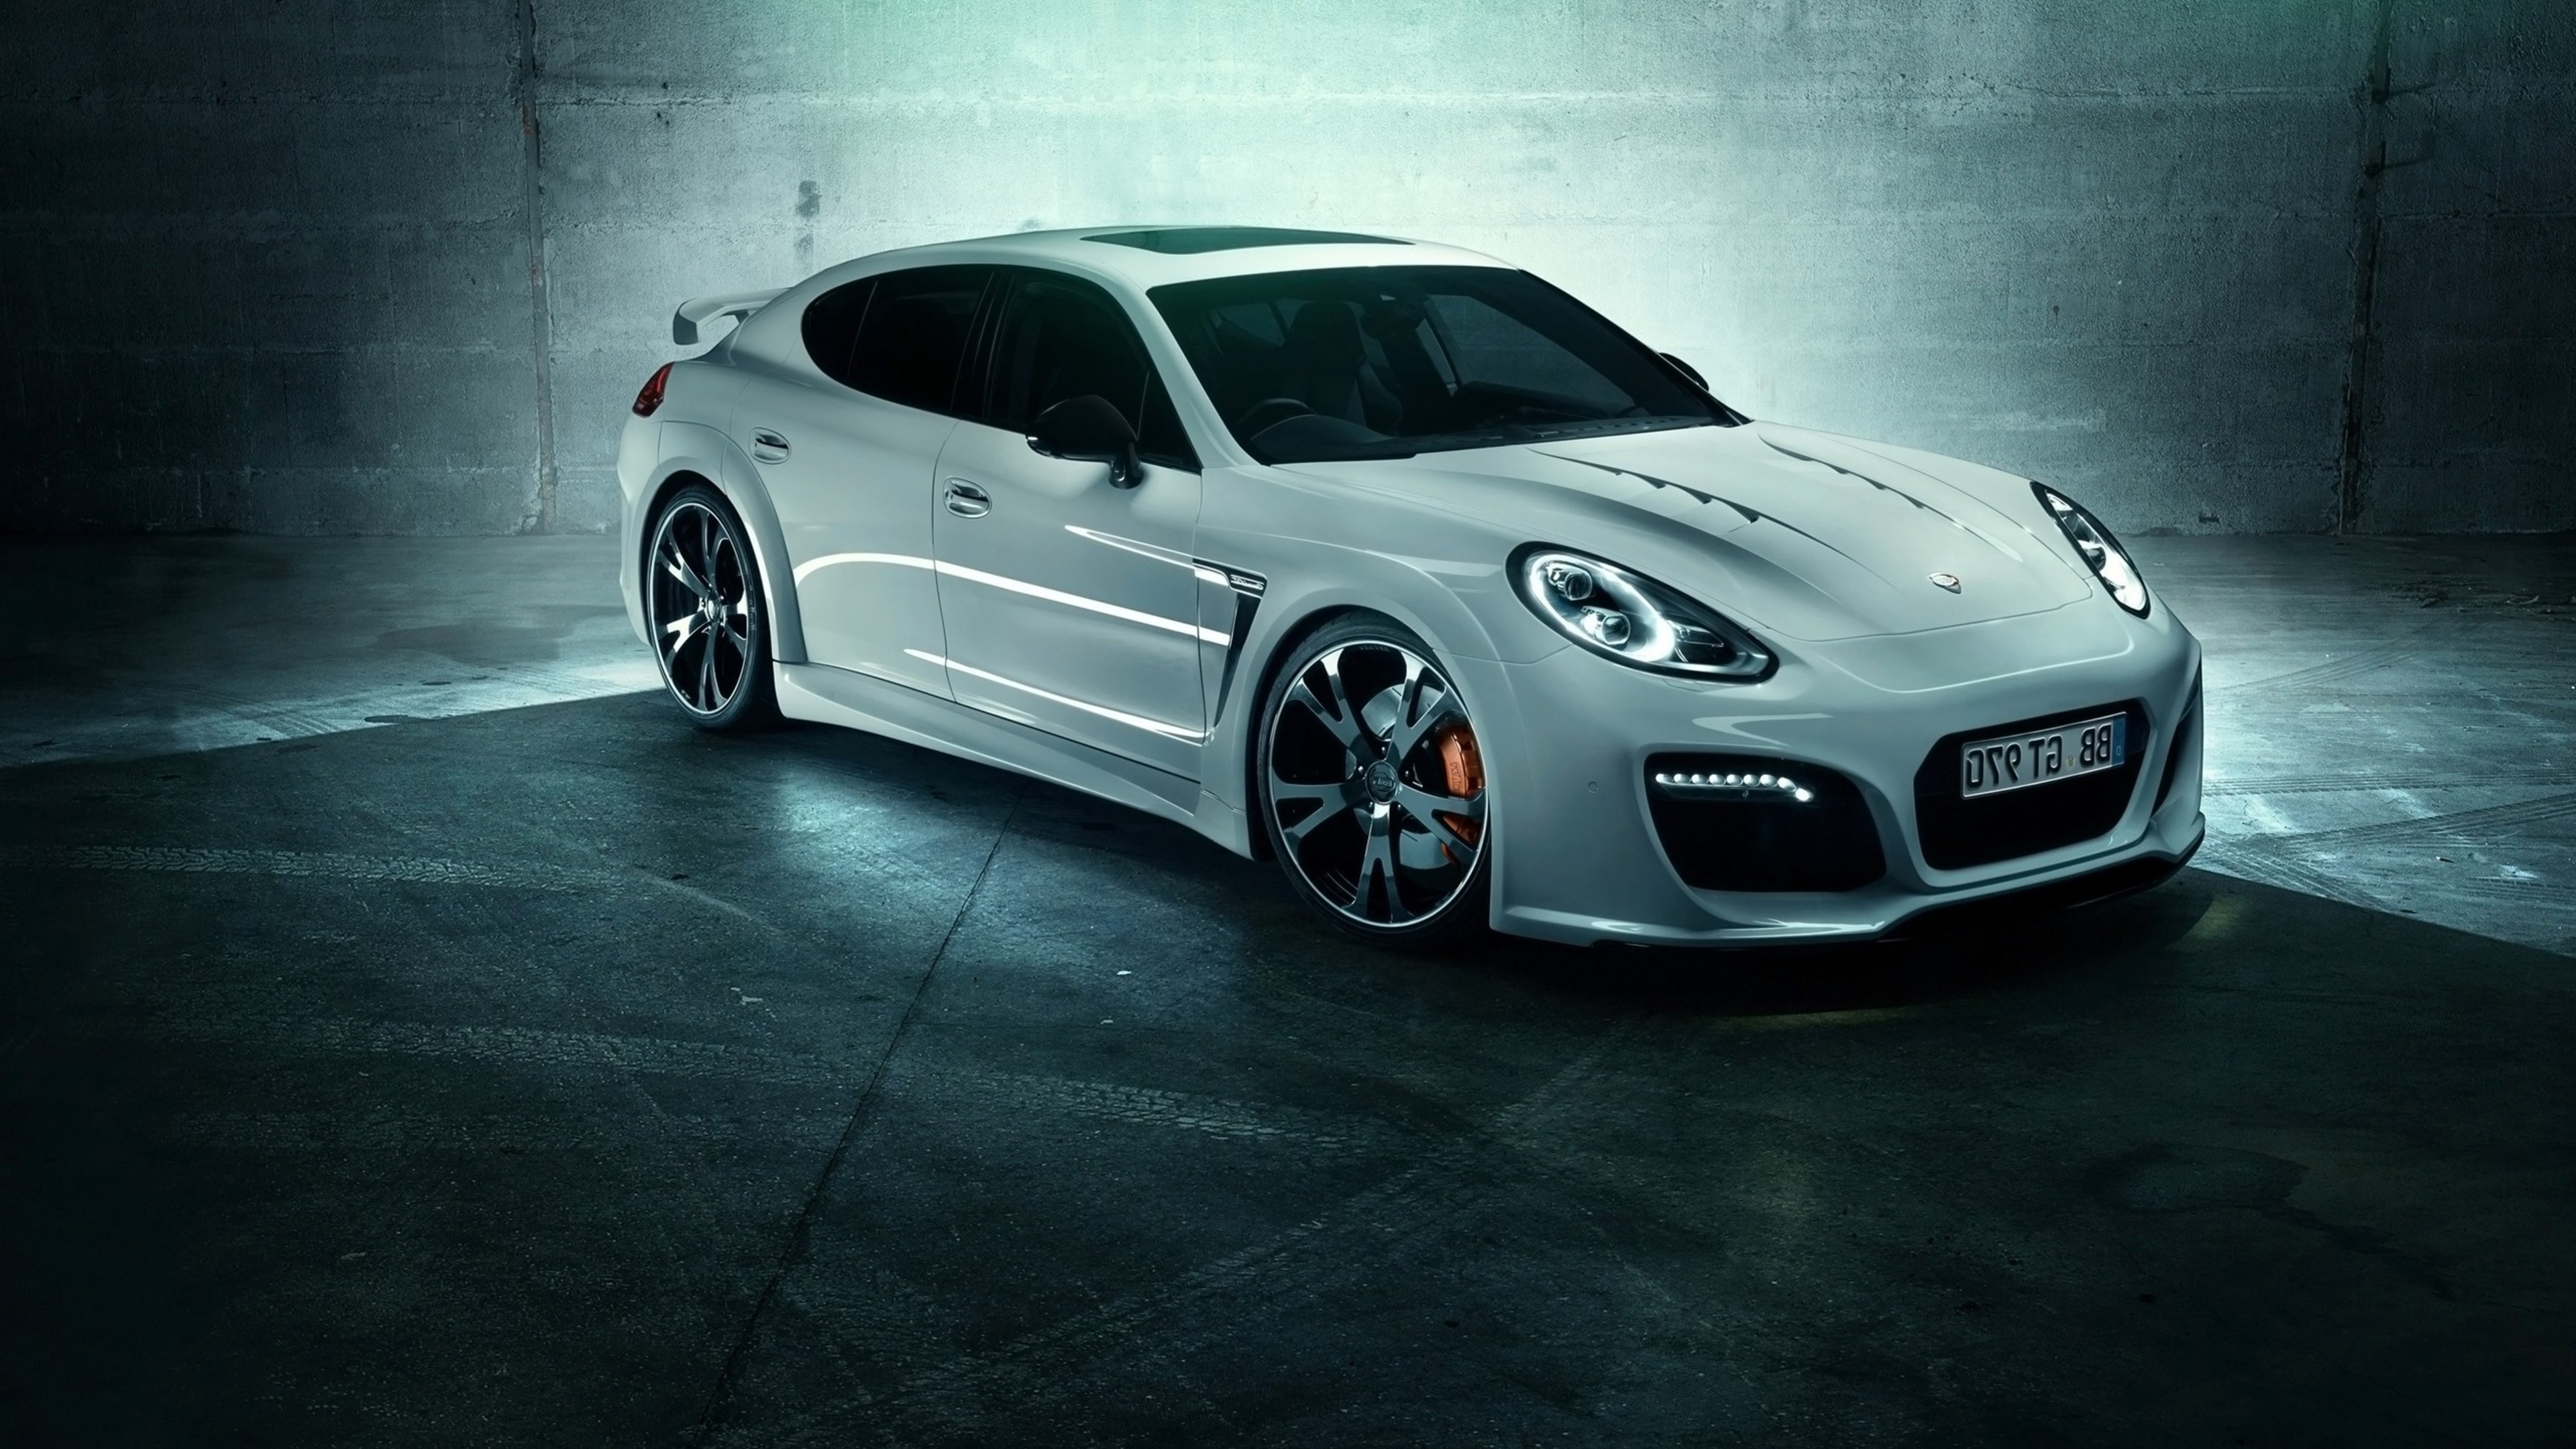 Porsche Panamera Turbo Porsche Panamera Wallpaper Hd